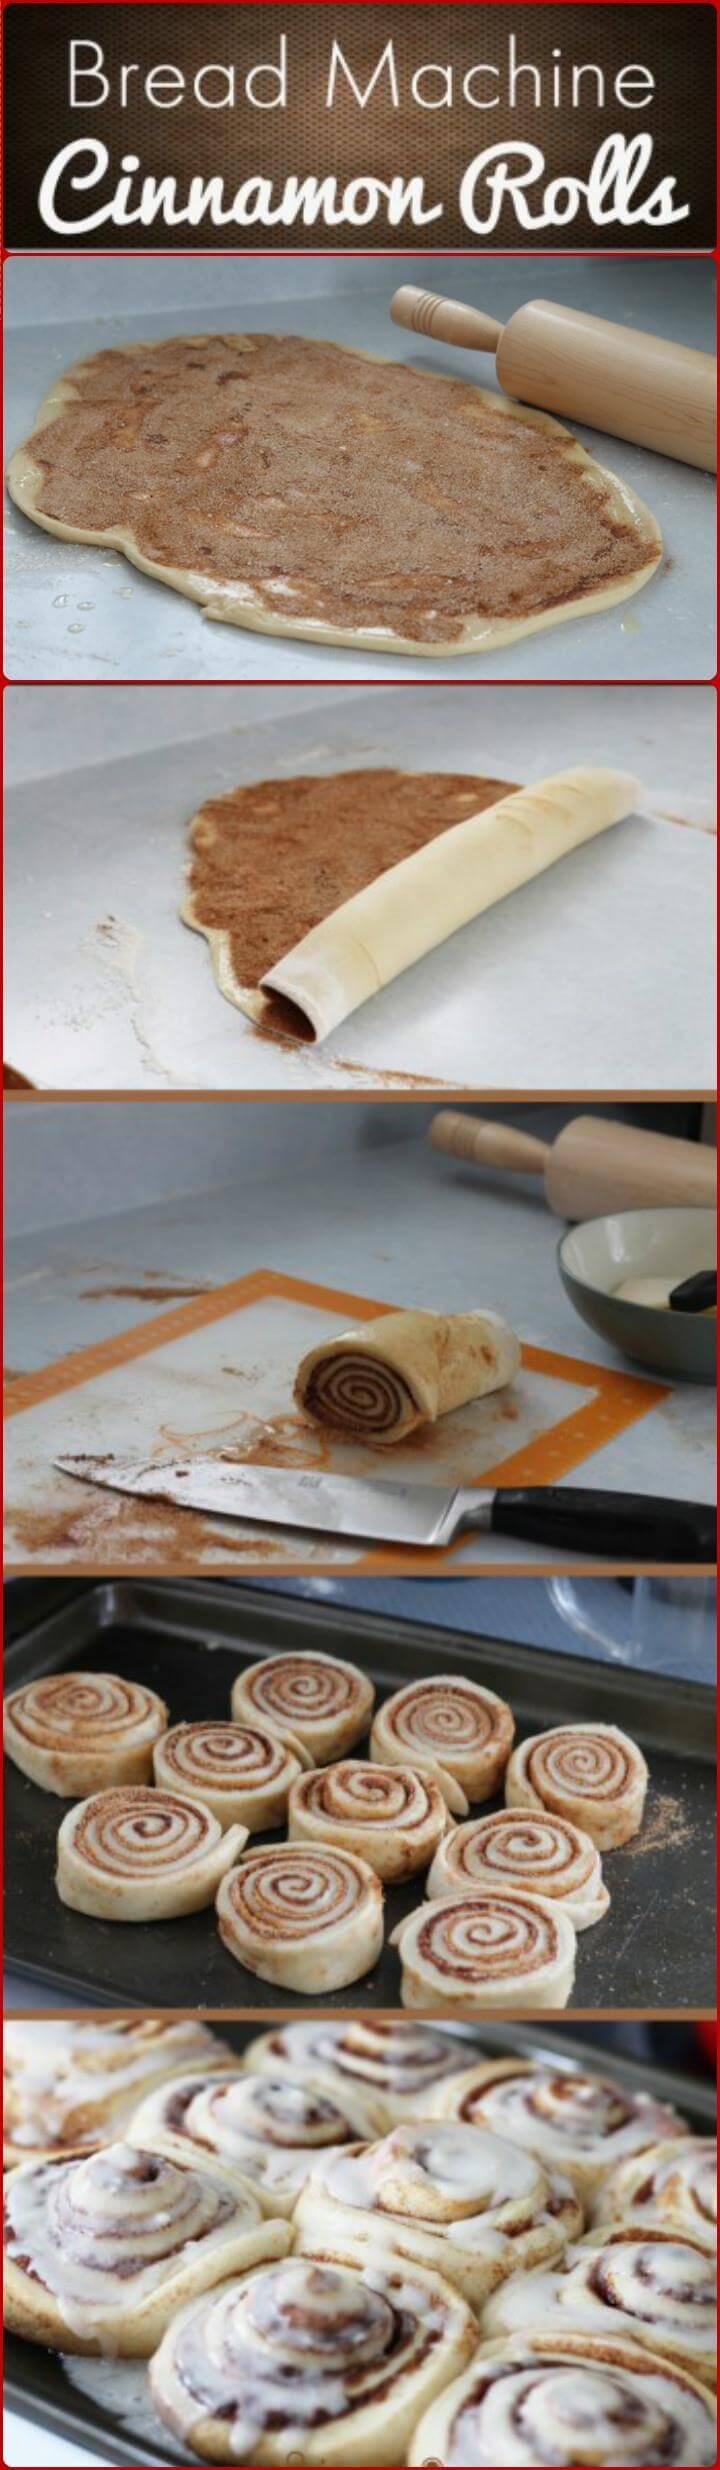 cheap yet delicious bread machine cinnamon rolls